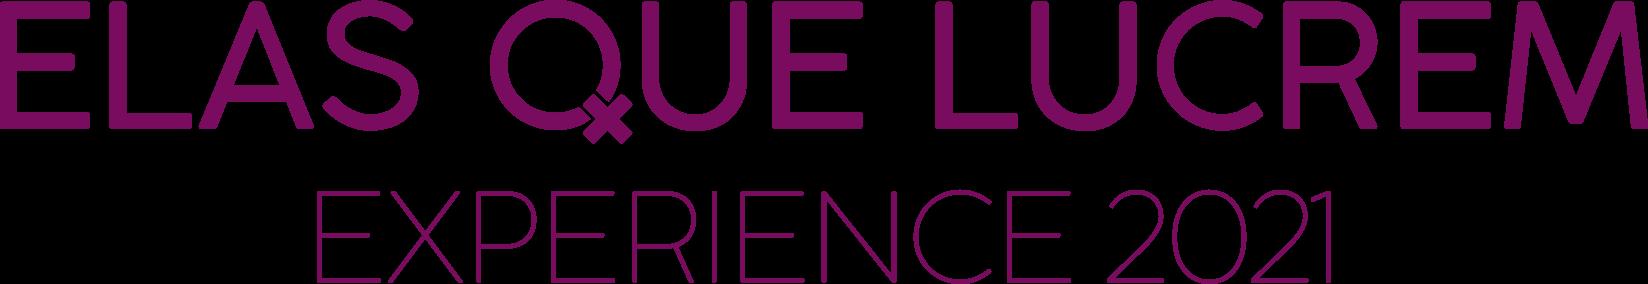 logo-experience-eql2